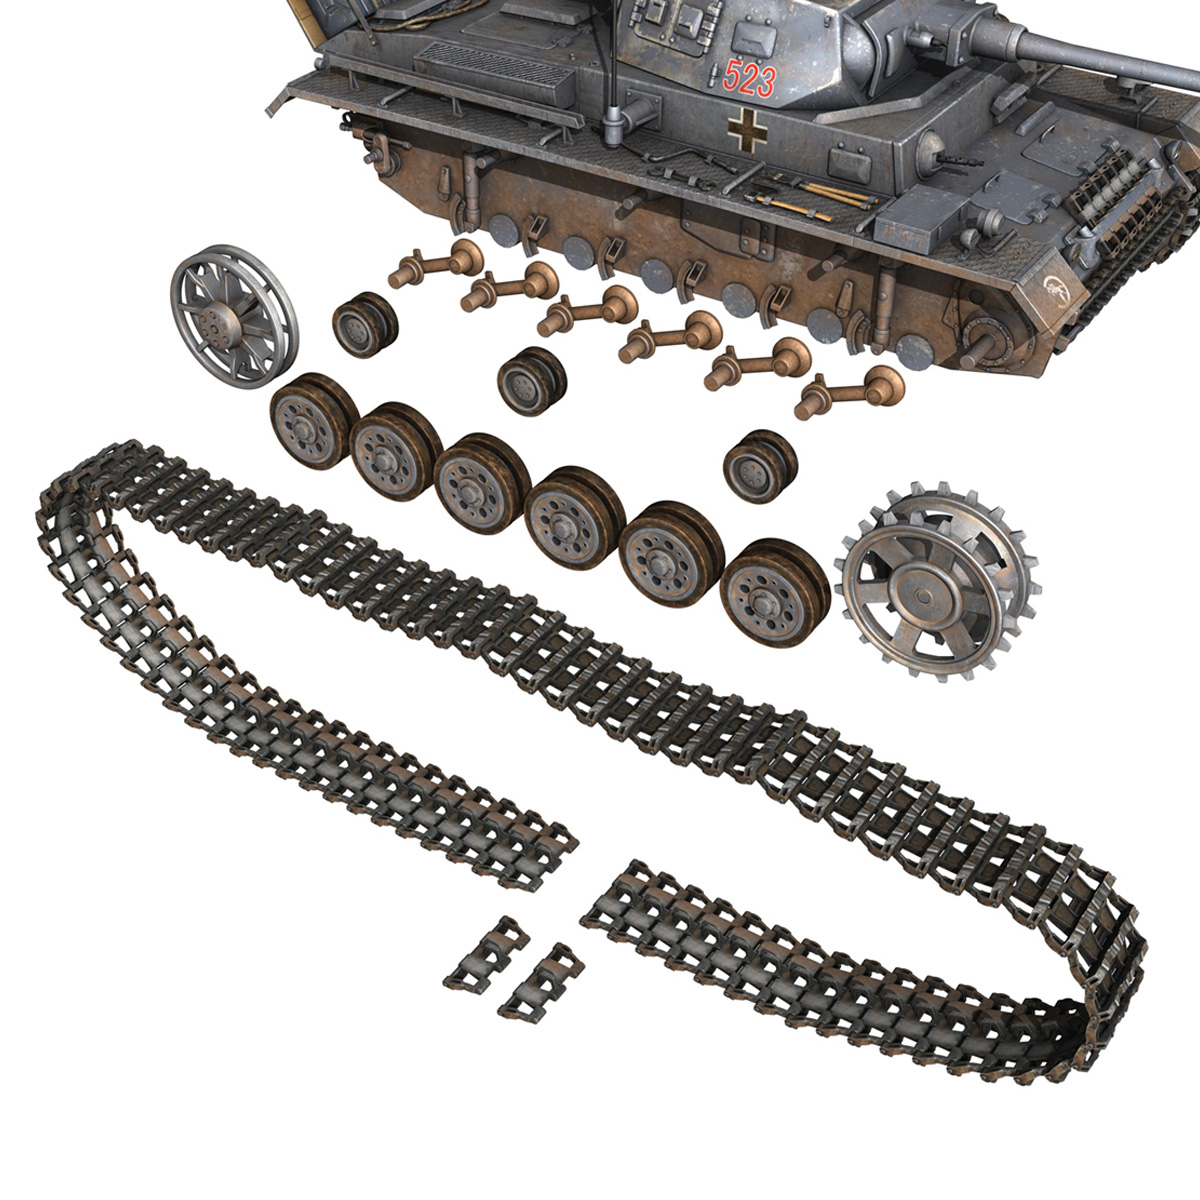 pzkpfw iii – panzer 3 – ausf.j – 523 3d model 3ds fbx c4d lwo obj 189082